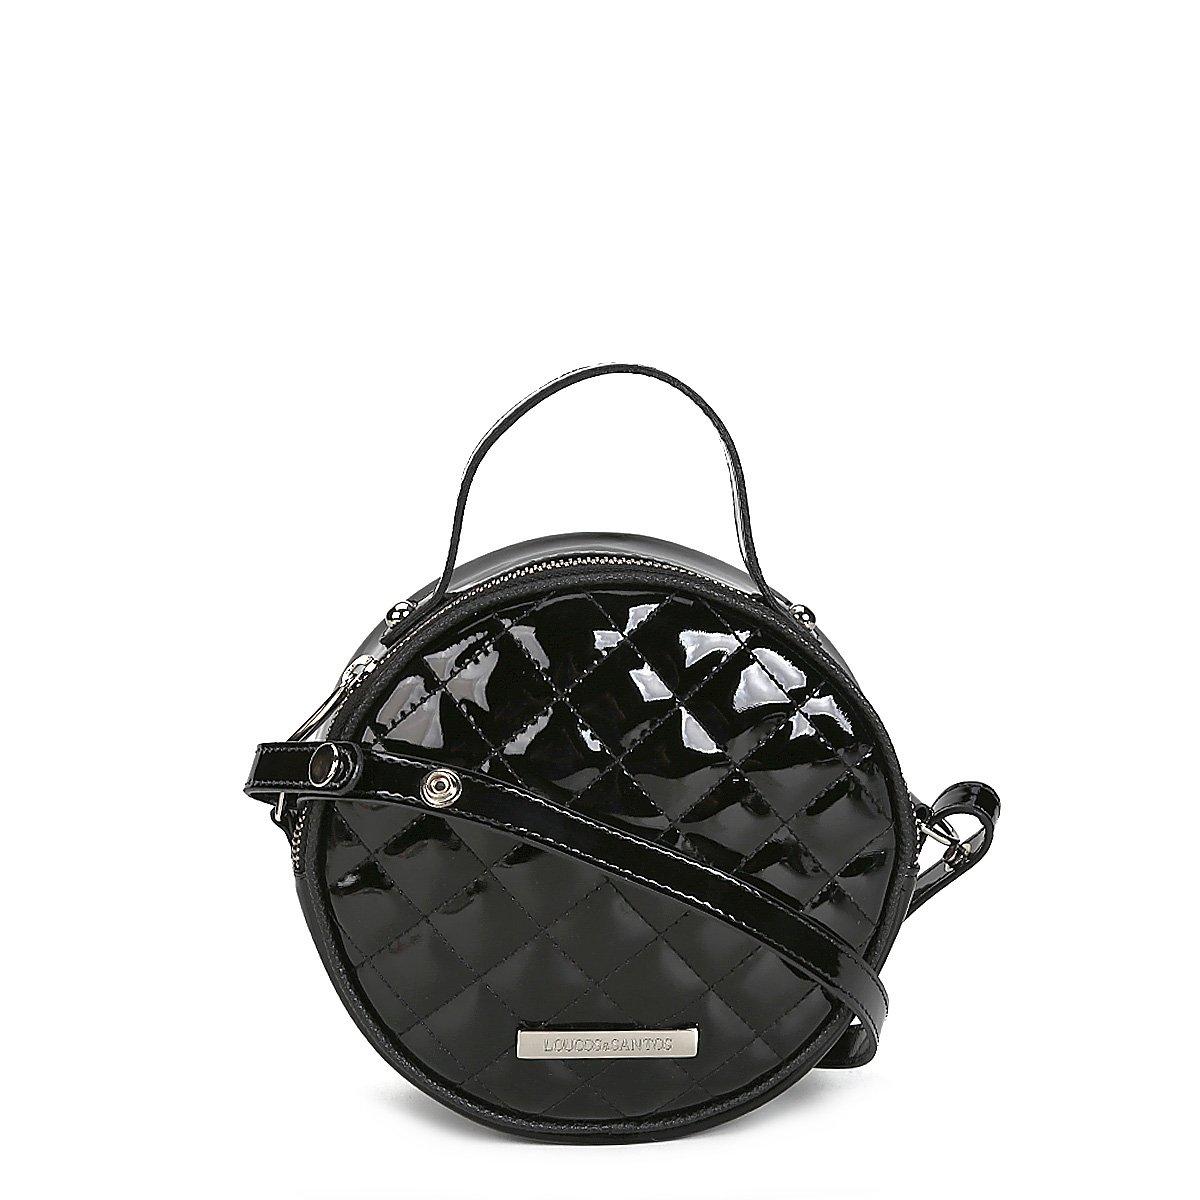 Bolsa Loucos e Santos Mini Bag Redonda Matelassê Verniz Feminina - Compre  Agora  06950b4b5cd